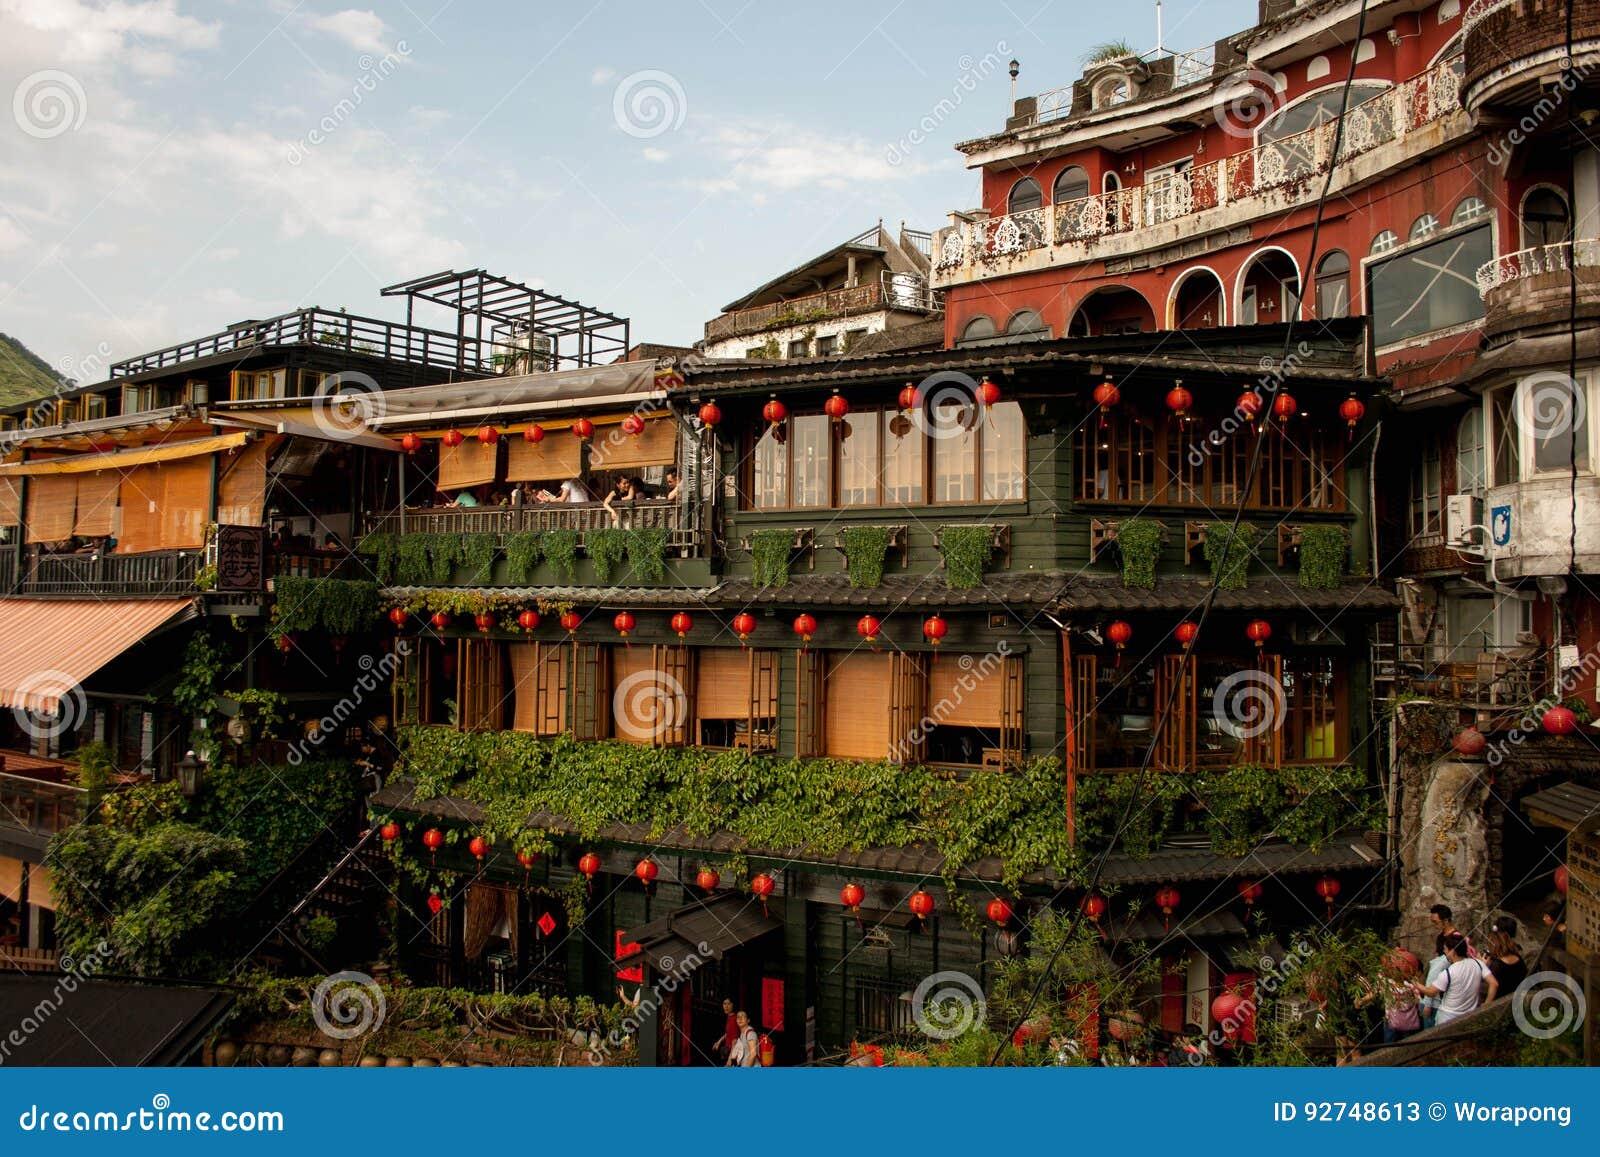 Mei Tea House, Jiufen, Taiwan Redaktionelles Stockfoto - Bild von